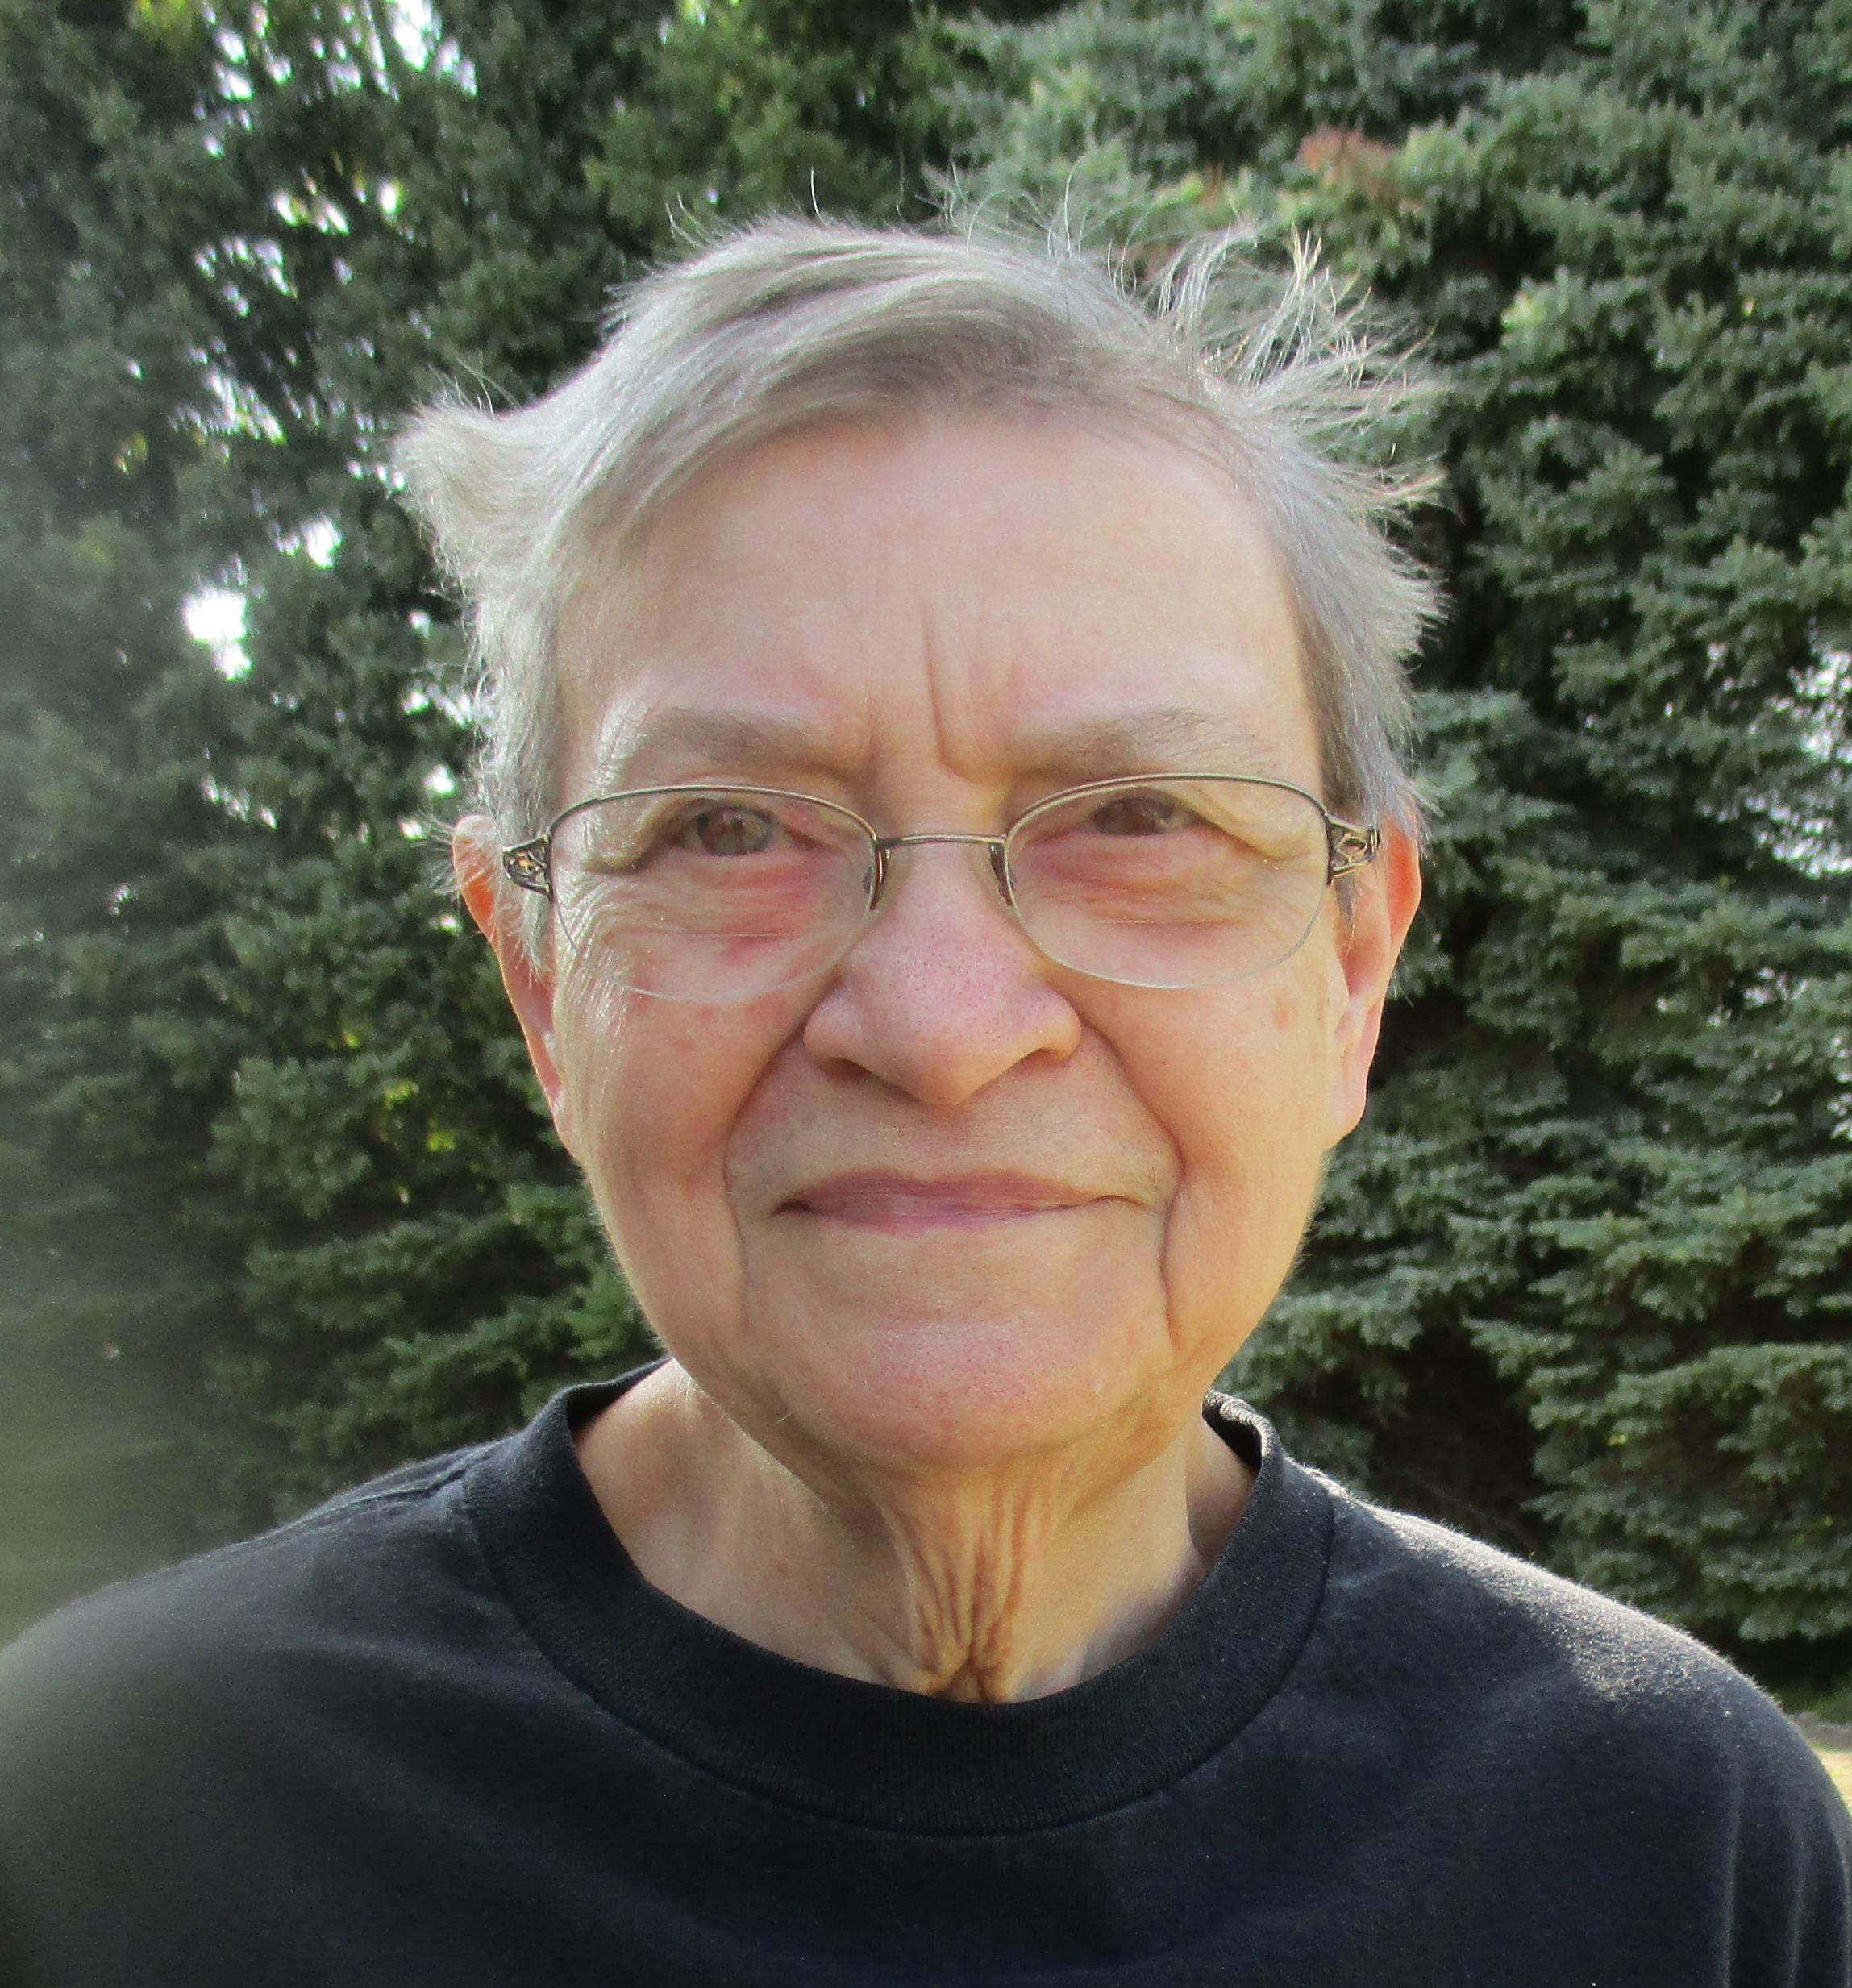 Marie Sylvia Vogelpohl: Marie Vogelpohl